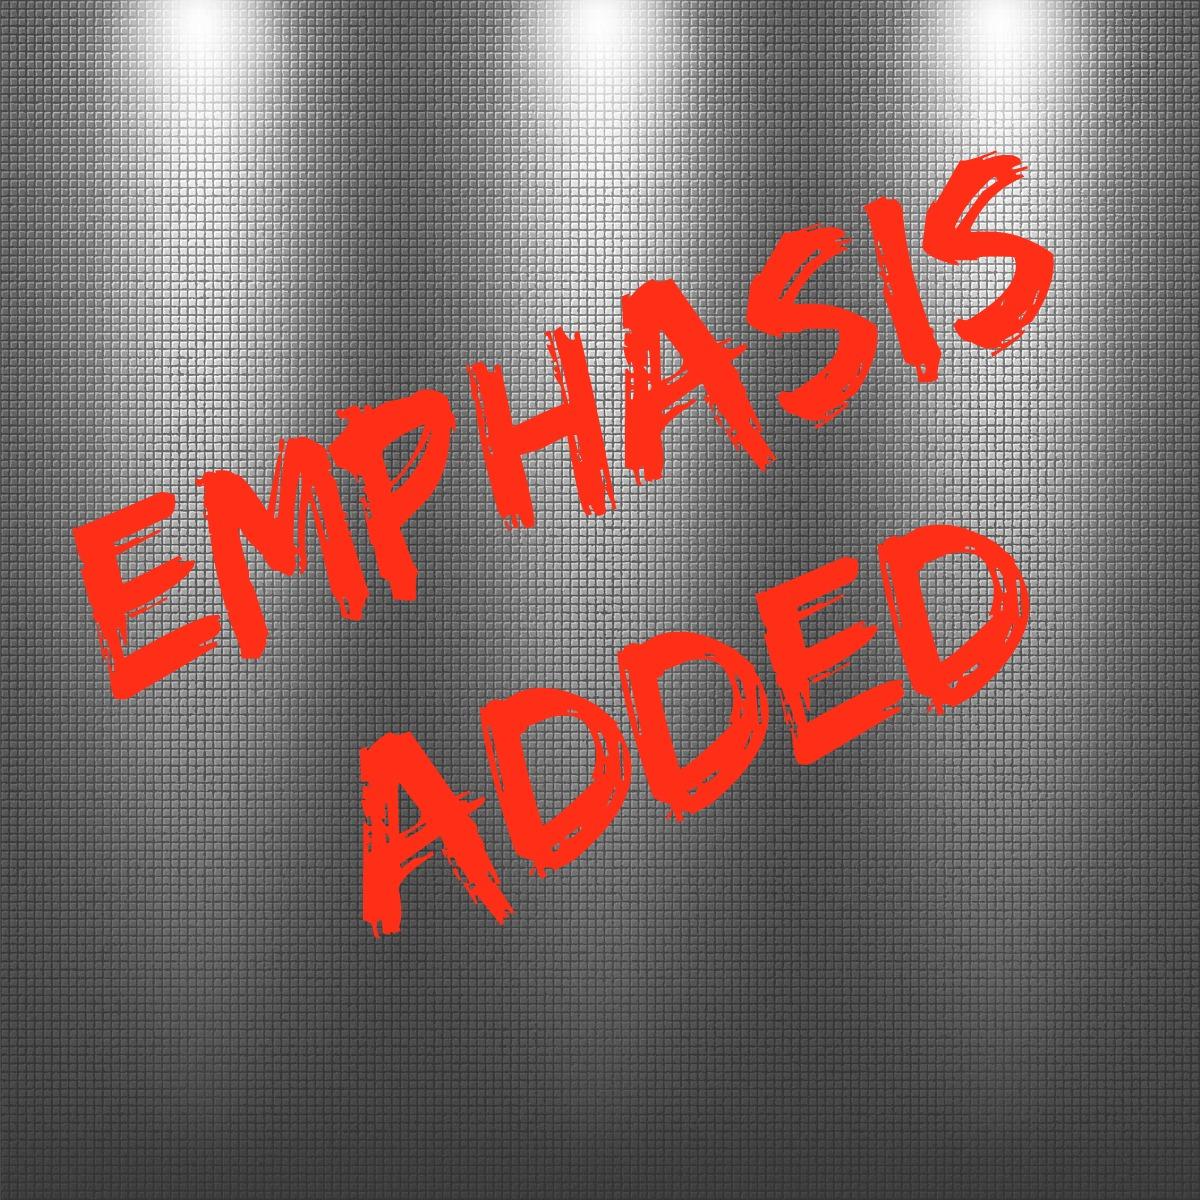 Emphasis Added